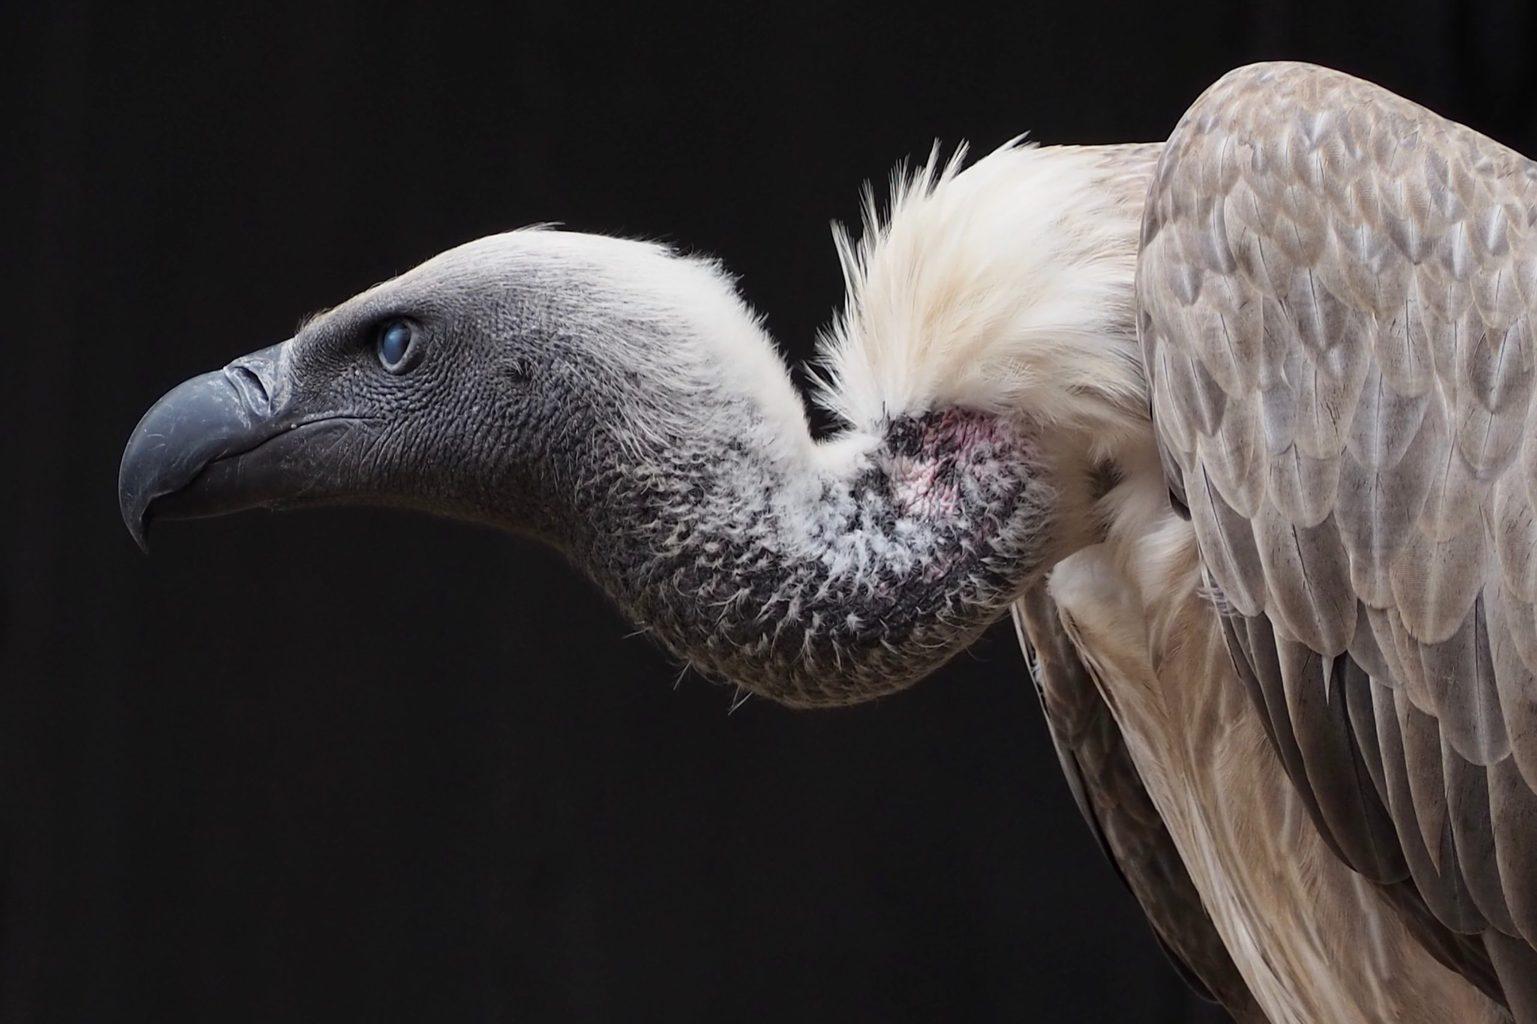 ave africana